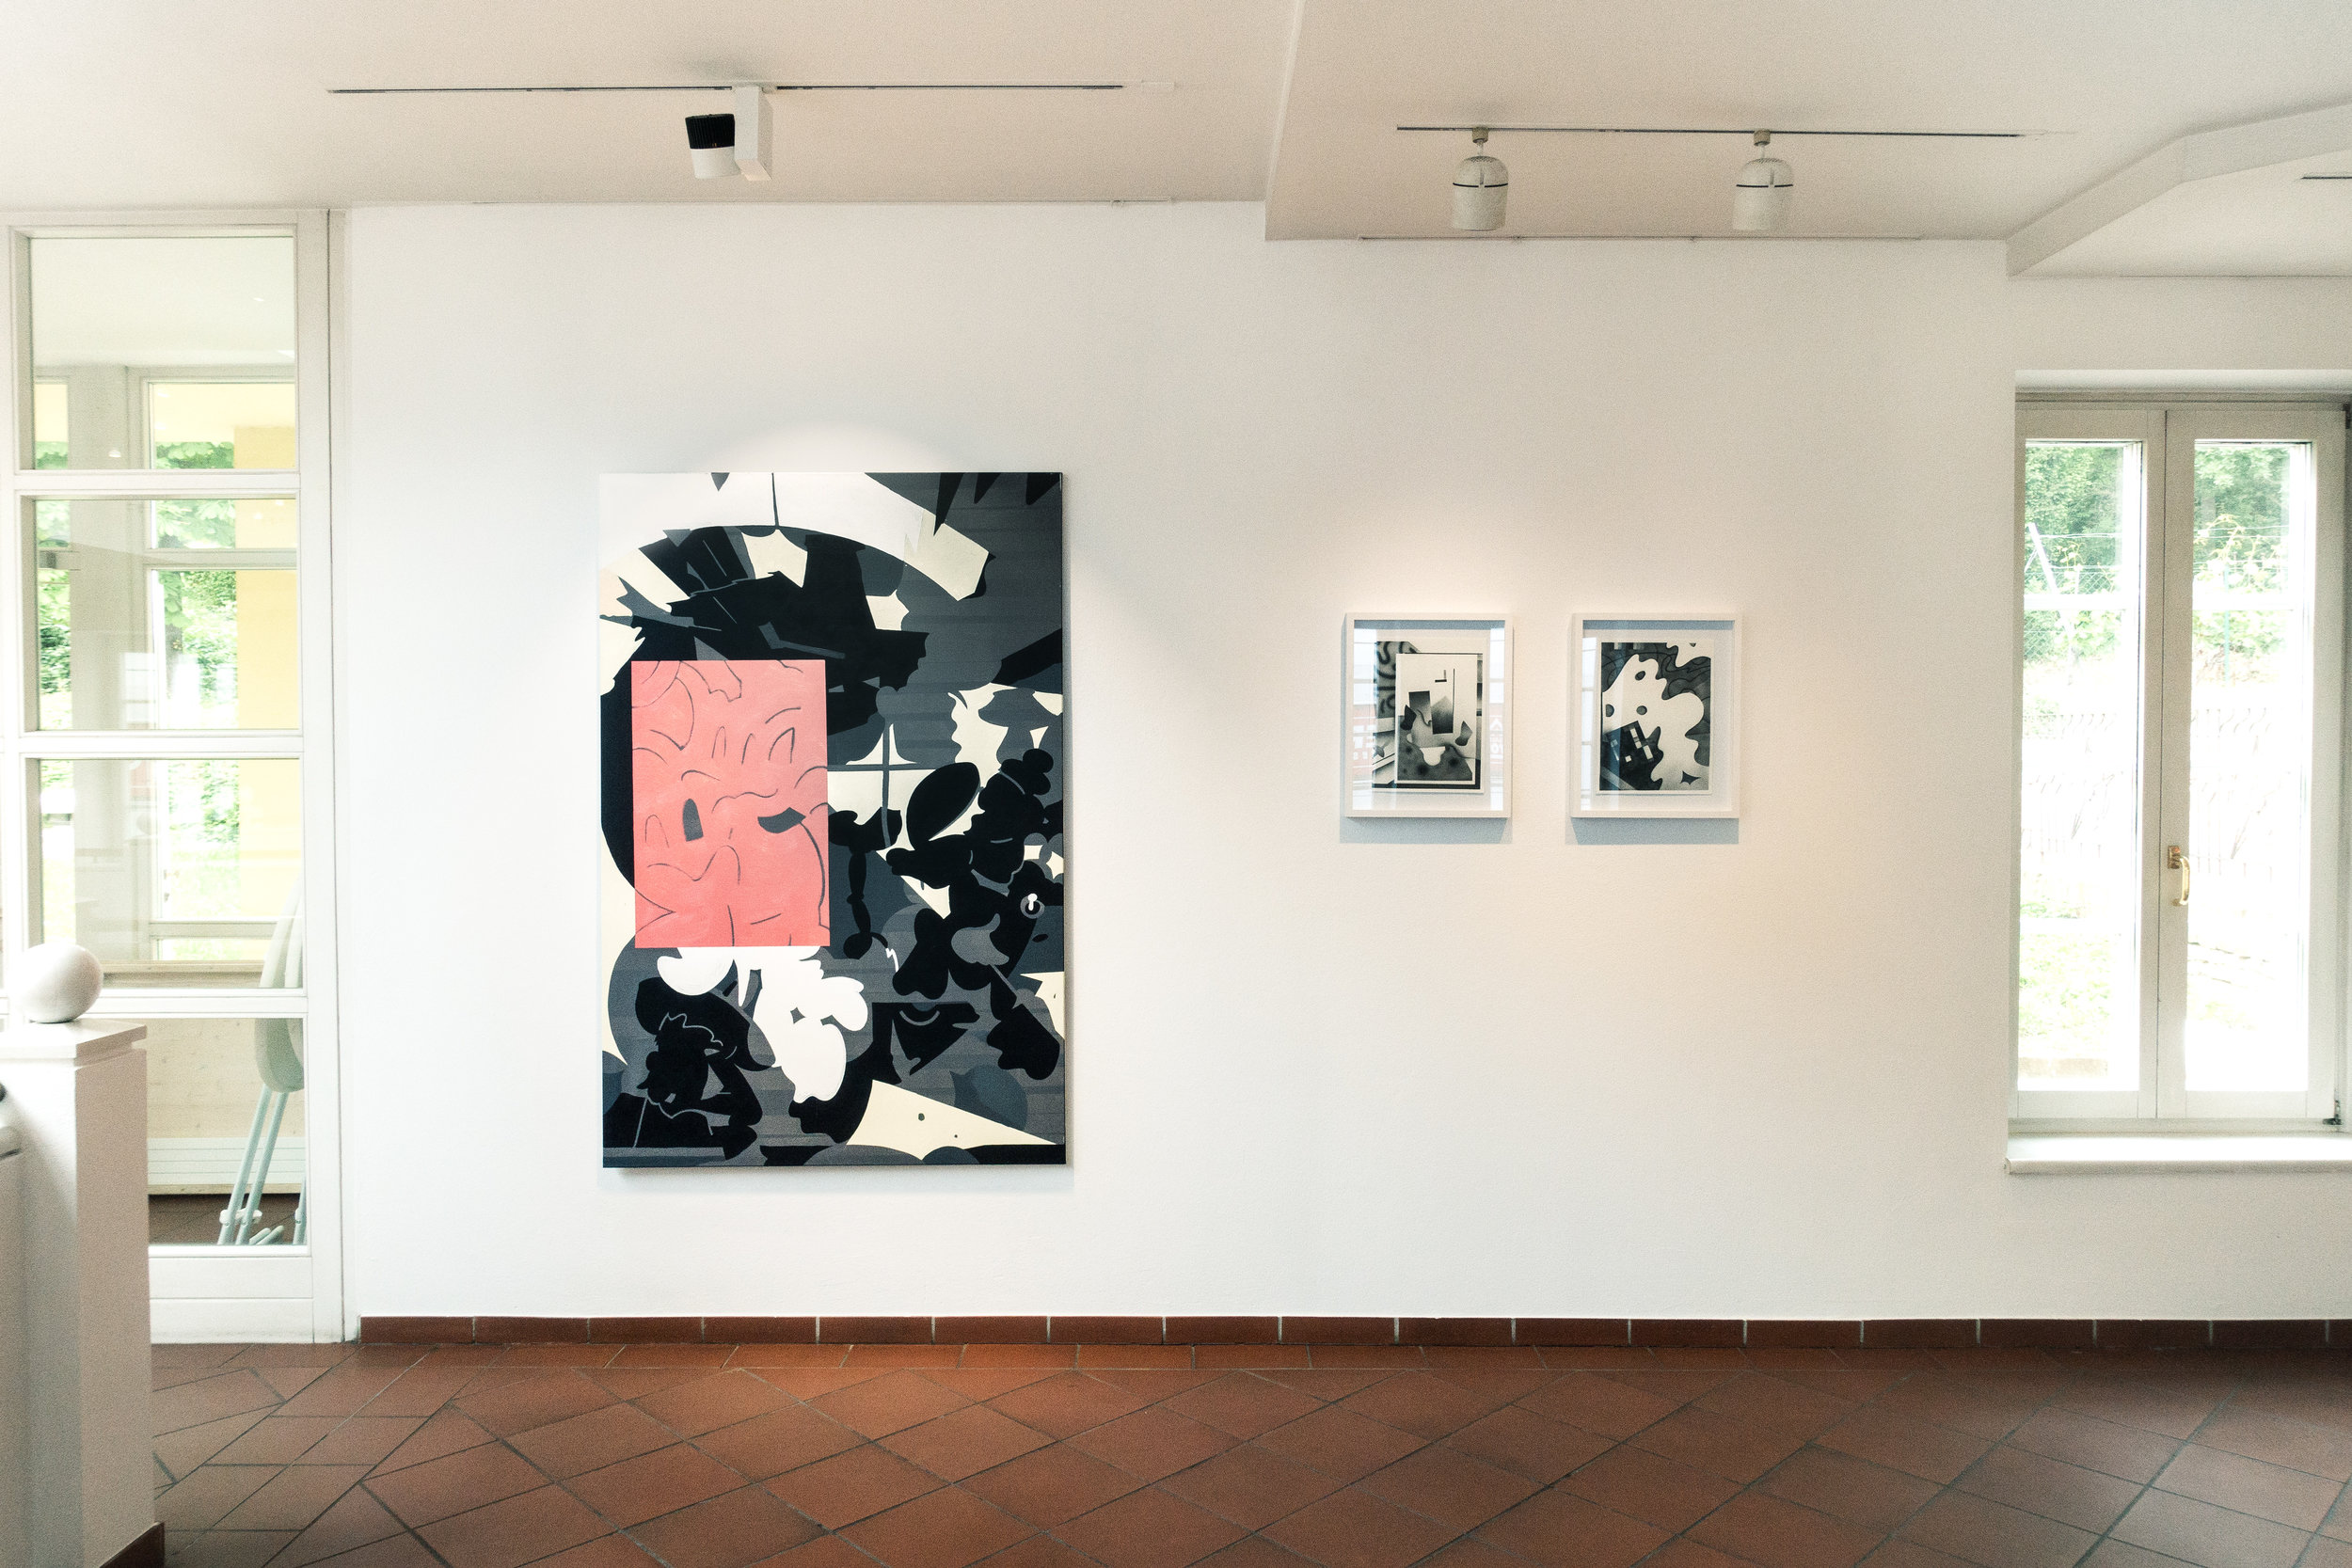 Instalationview-Schlumberger-ArtFloor-Paul-Riedmueller-2018-03.jpg